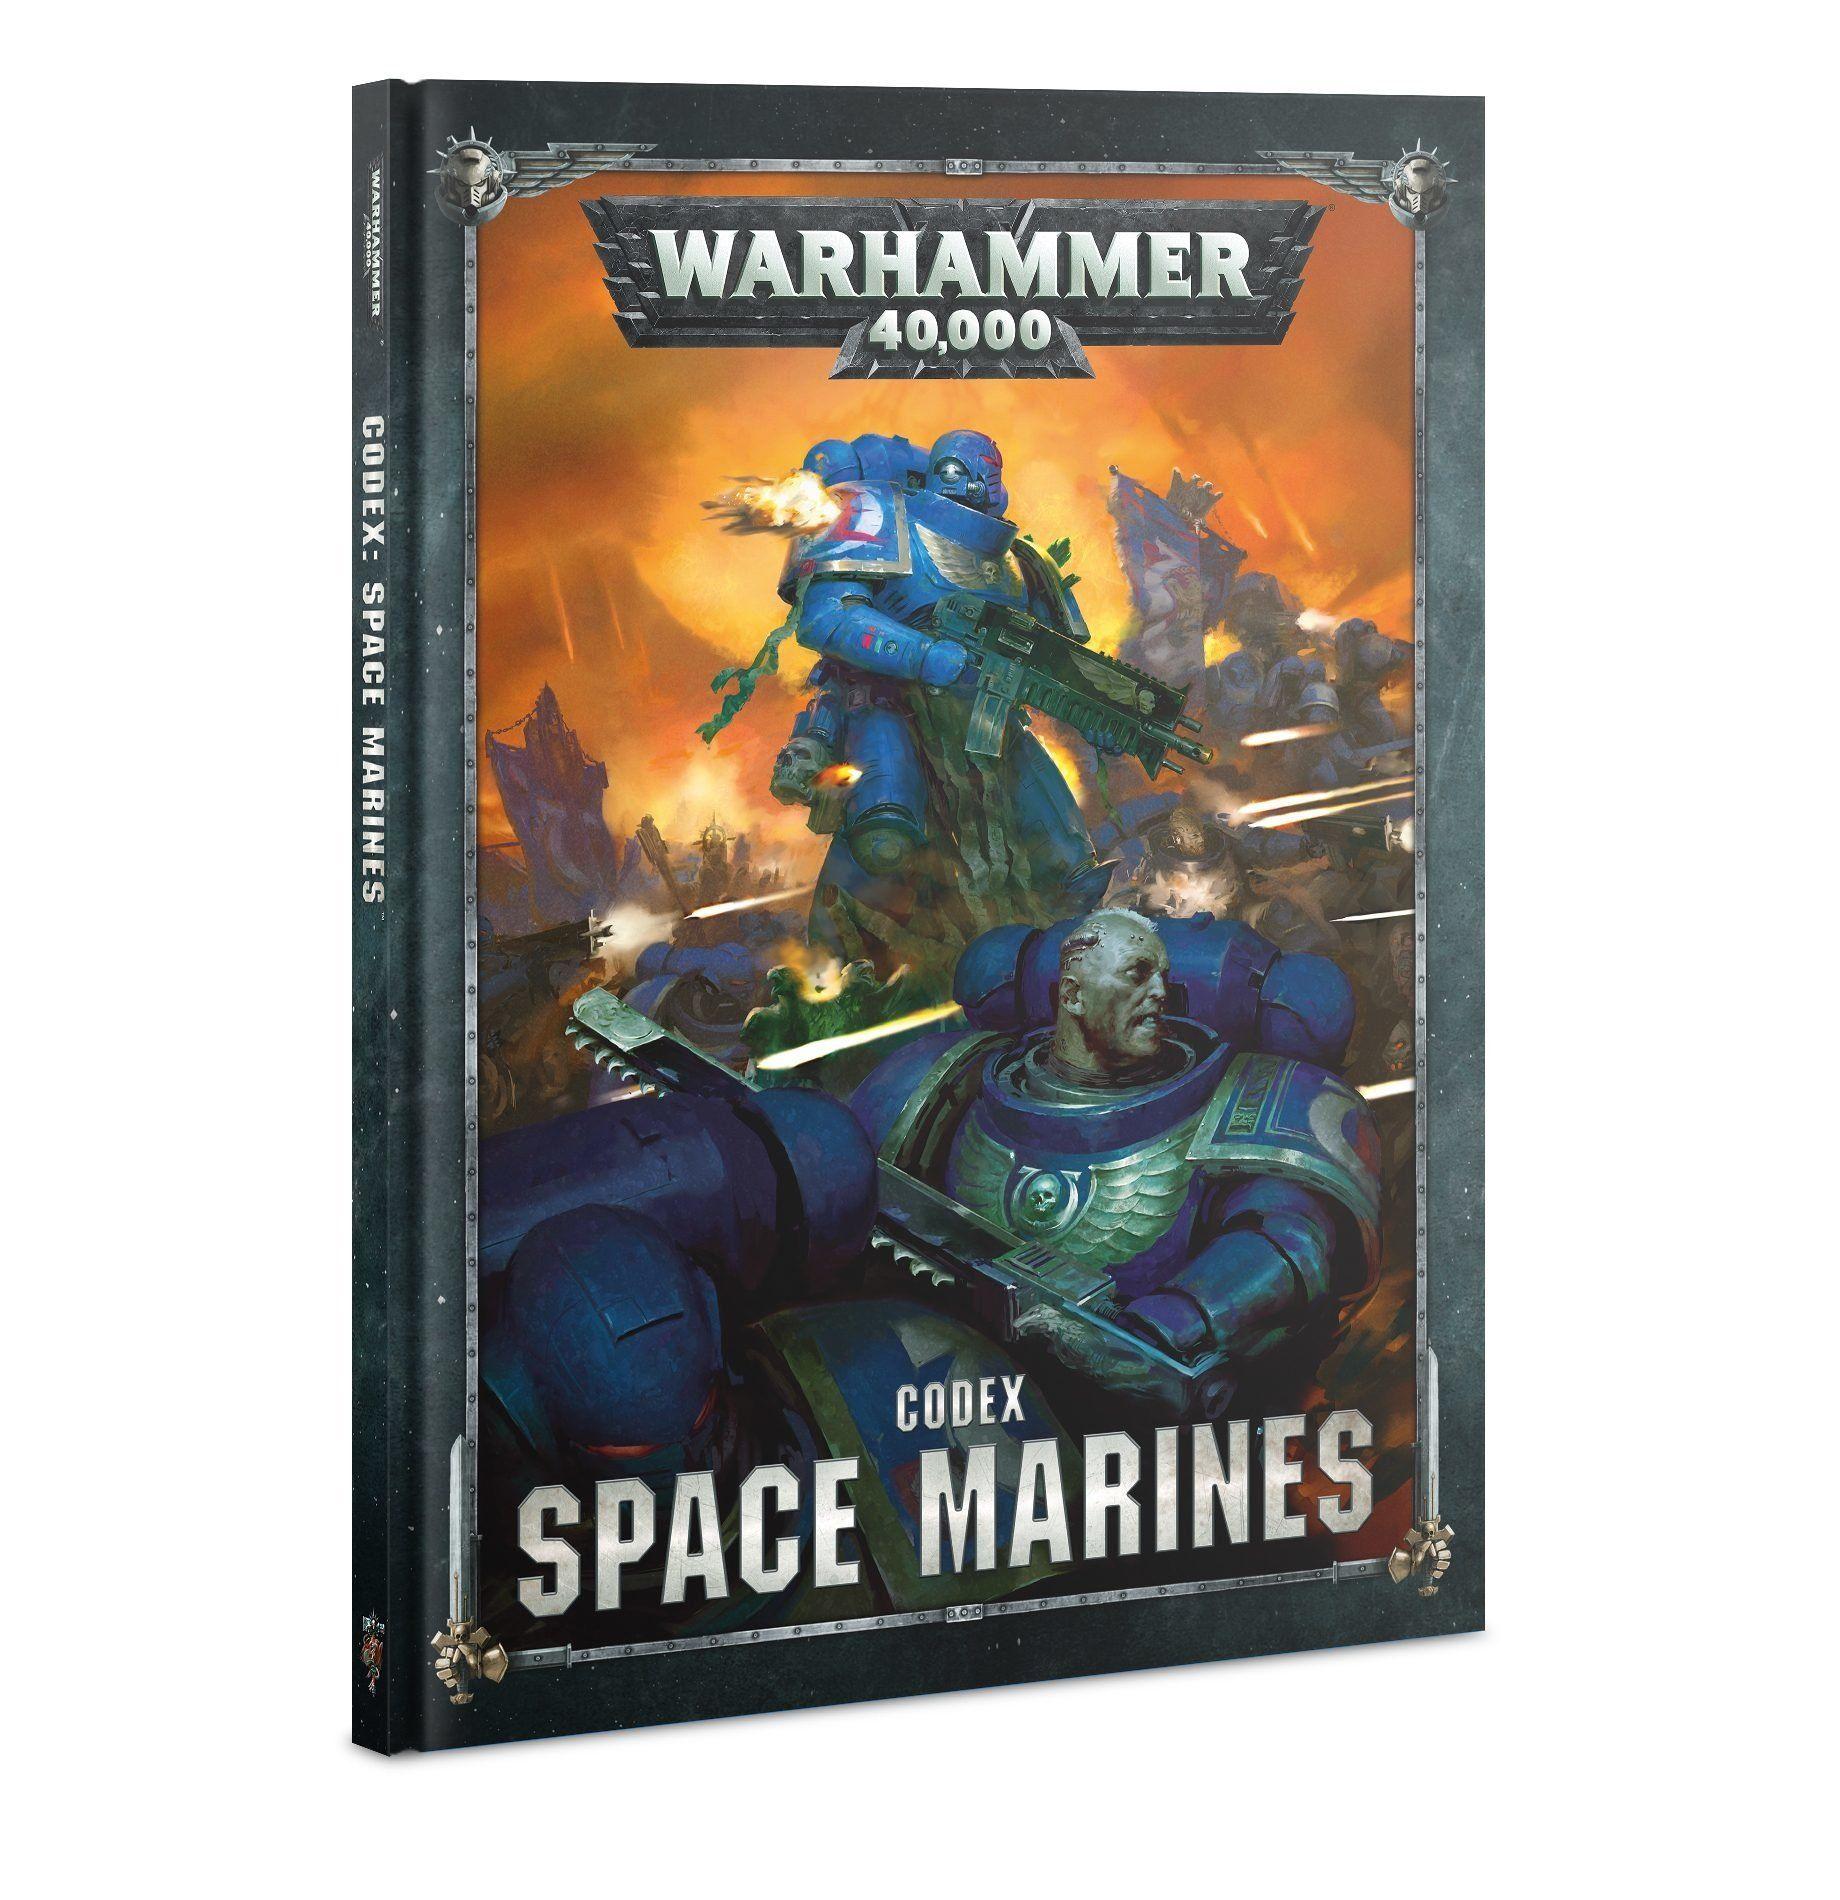 Warhammer Codex Space Marines Hardback